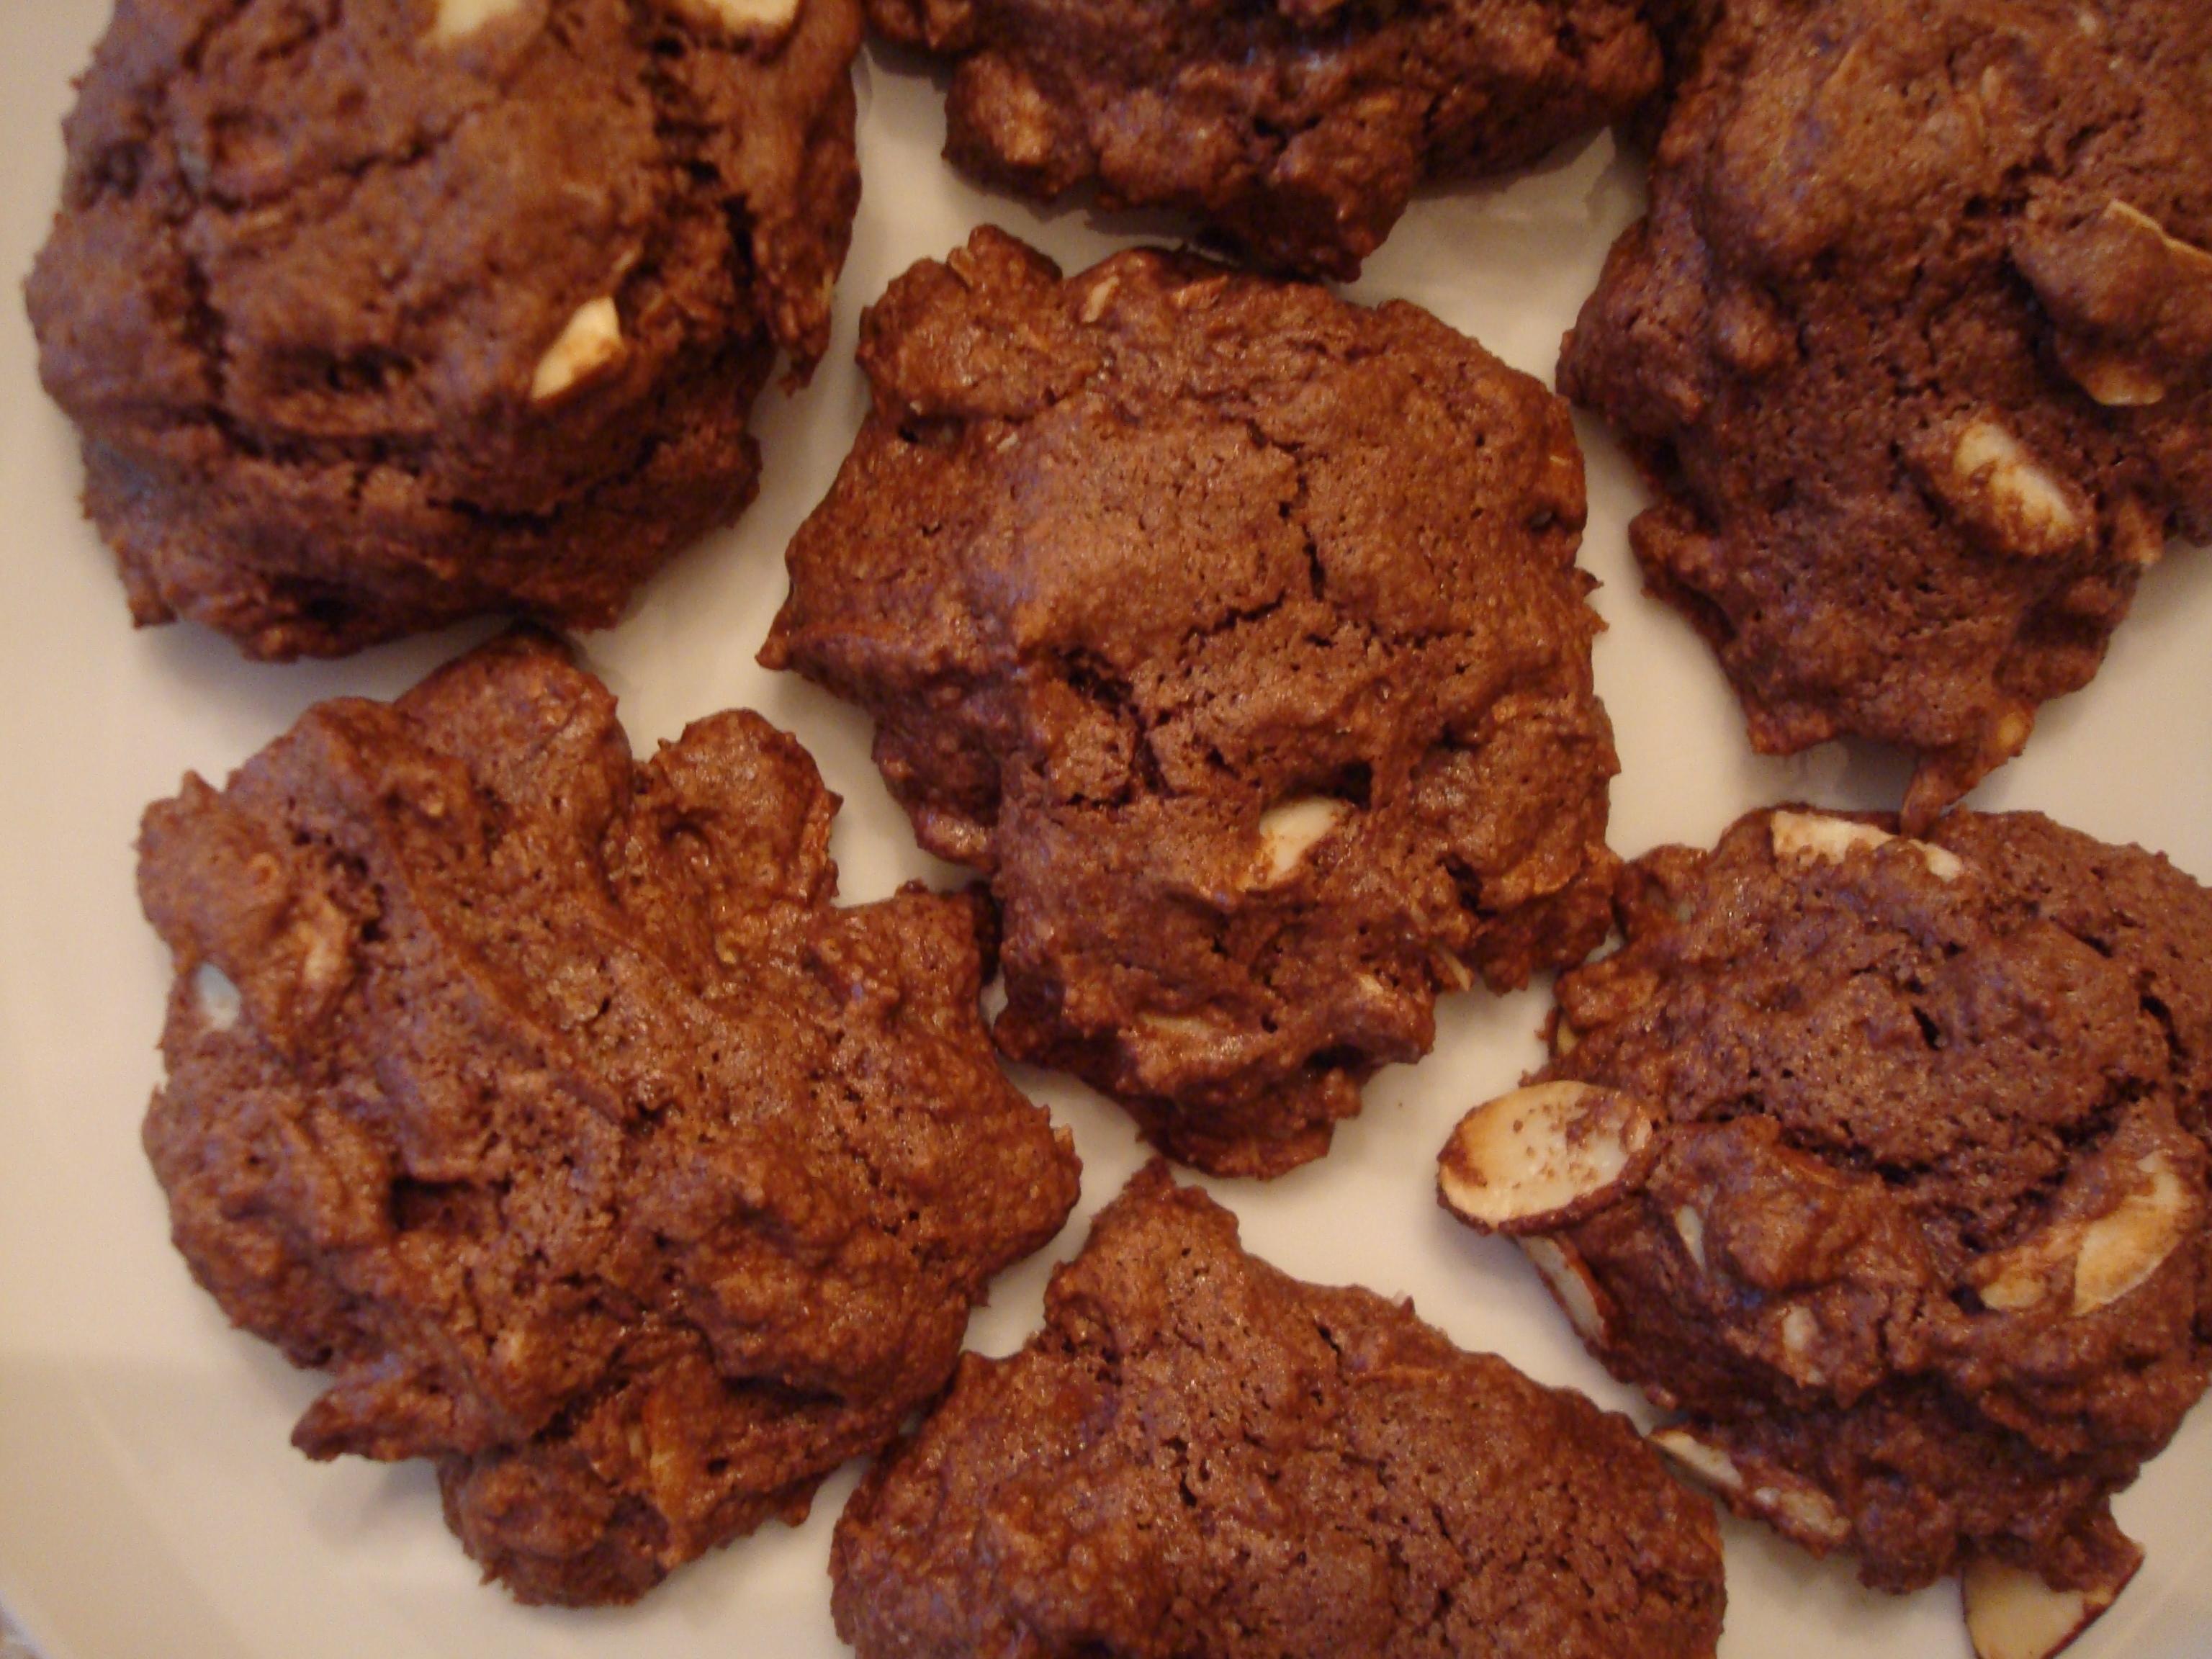 Recipe of chocolate almond cookies